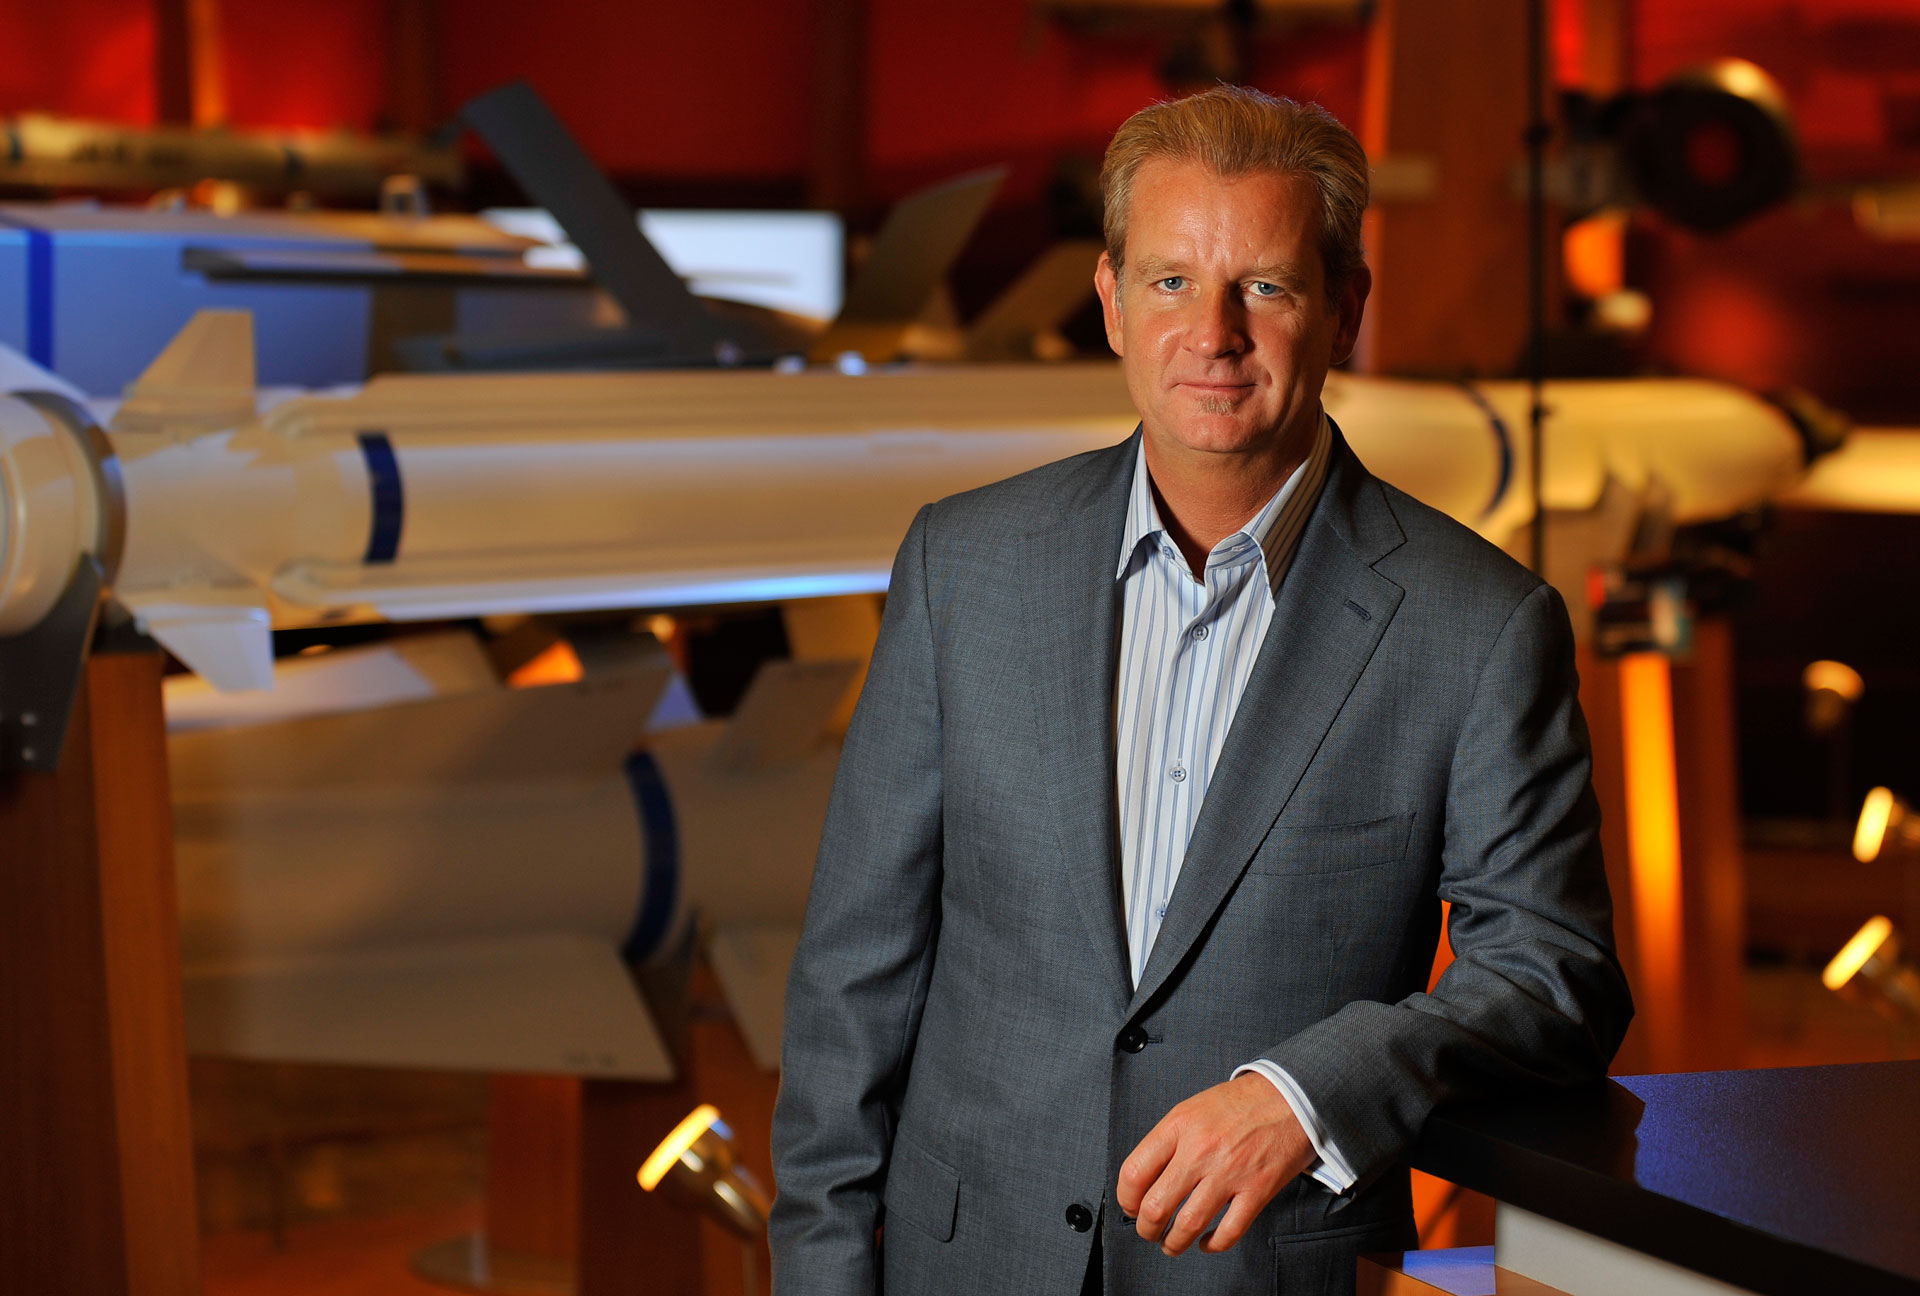 _BHW0260-Raytheon-CEO-Smart-Web.jpg